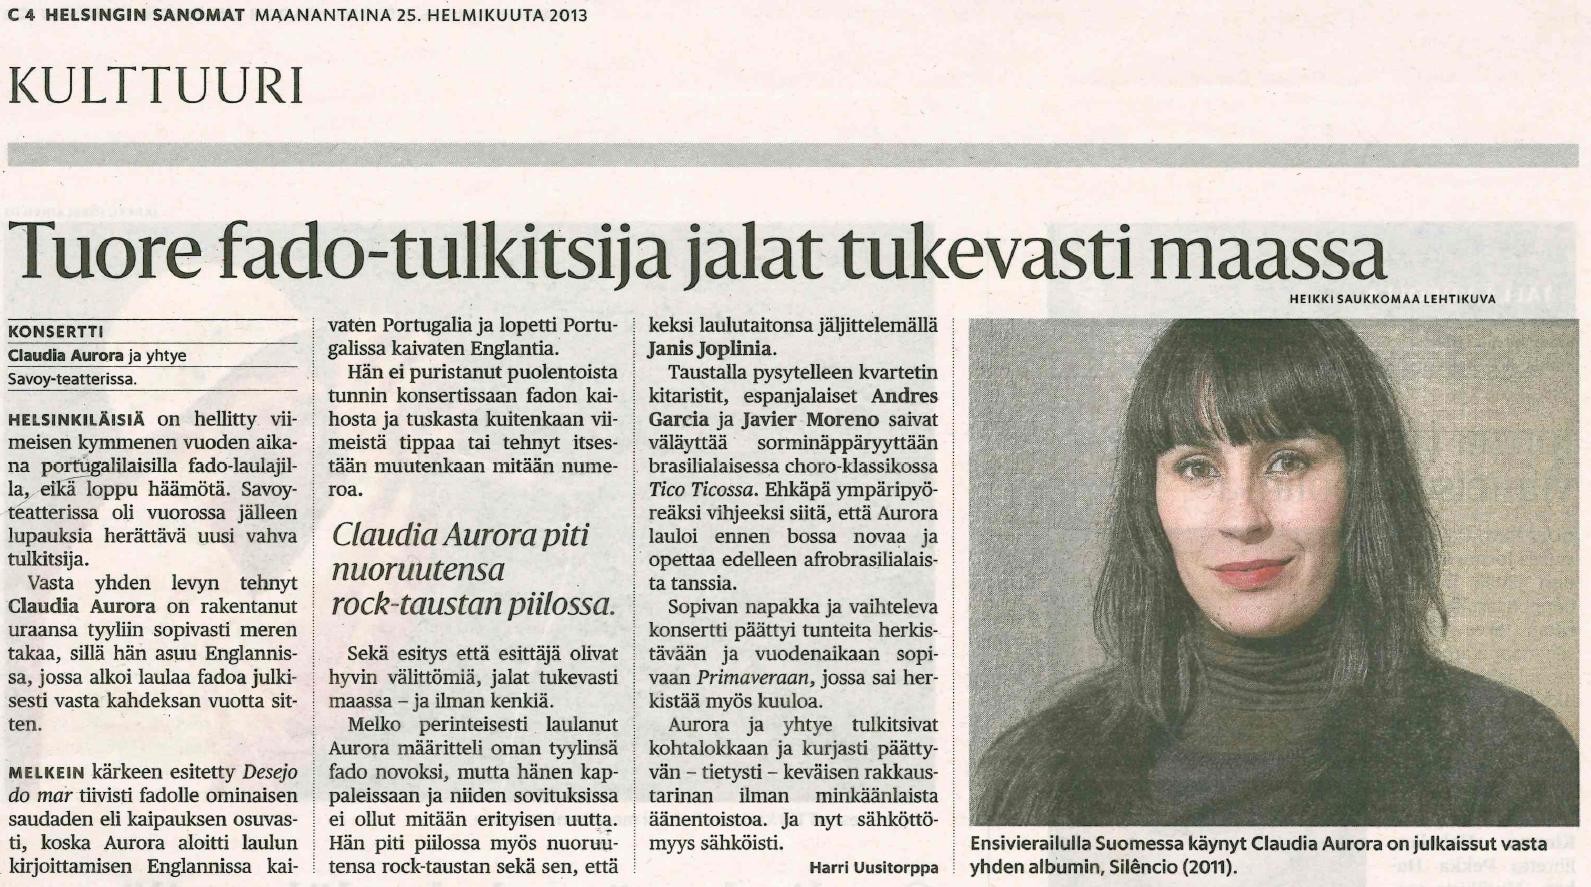 130225 Helsingin Sanomat (biggest newspaper in Finland)